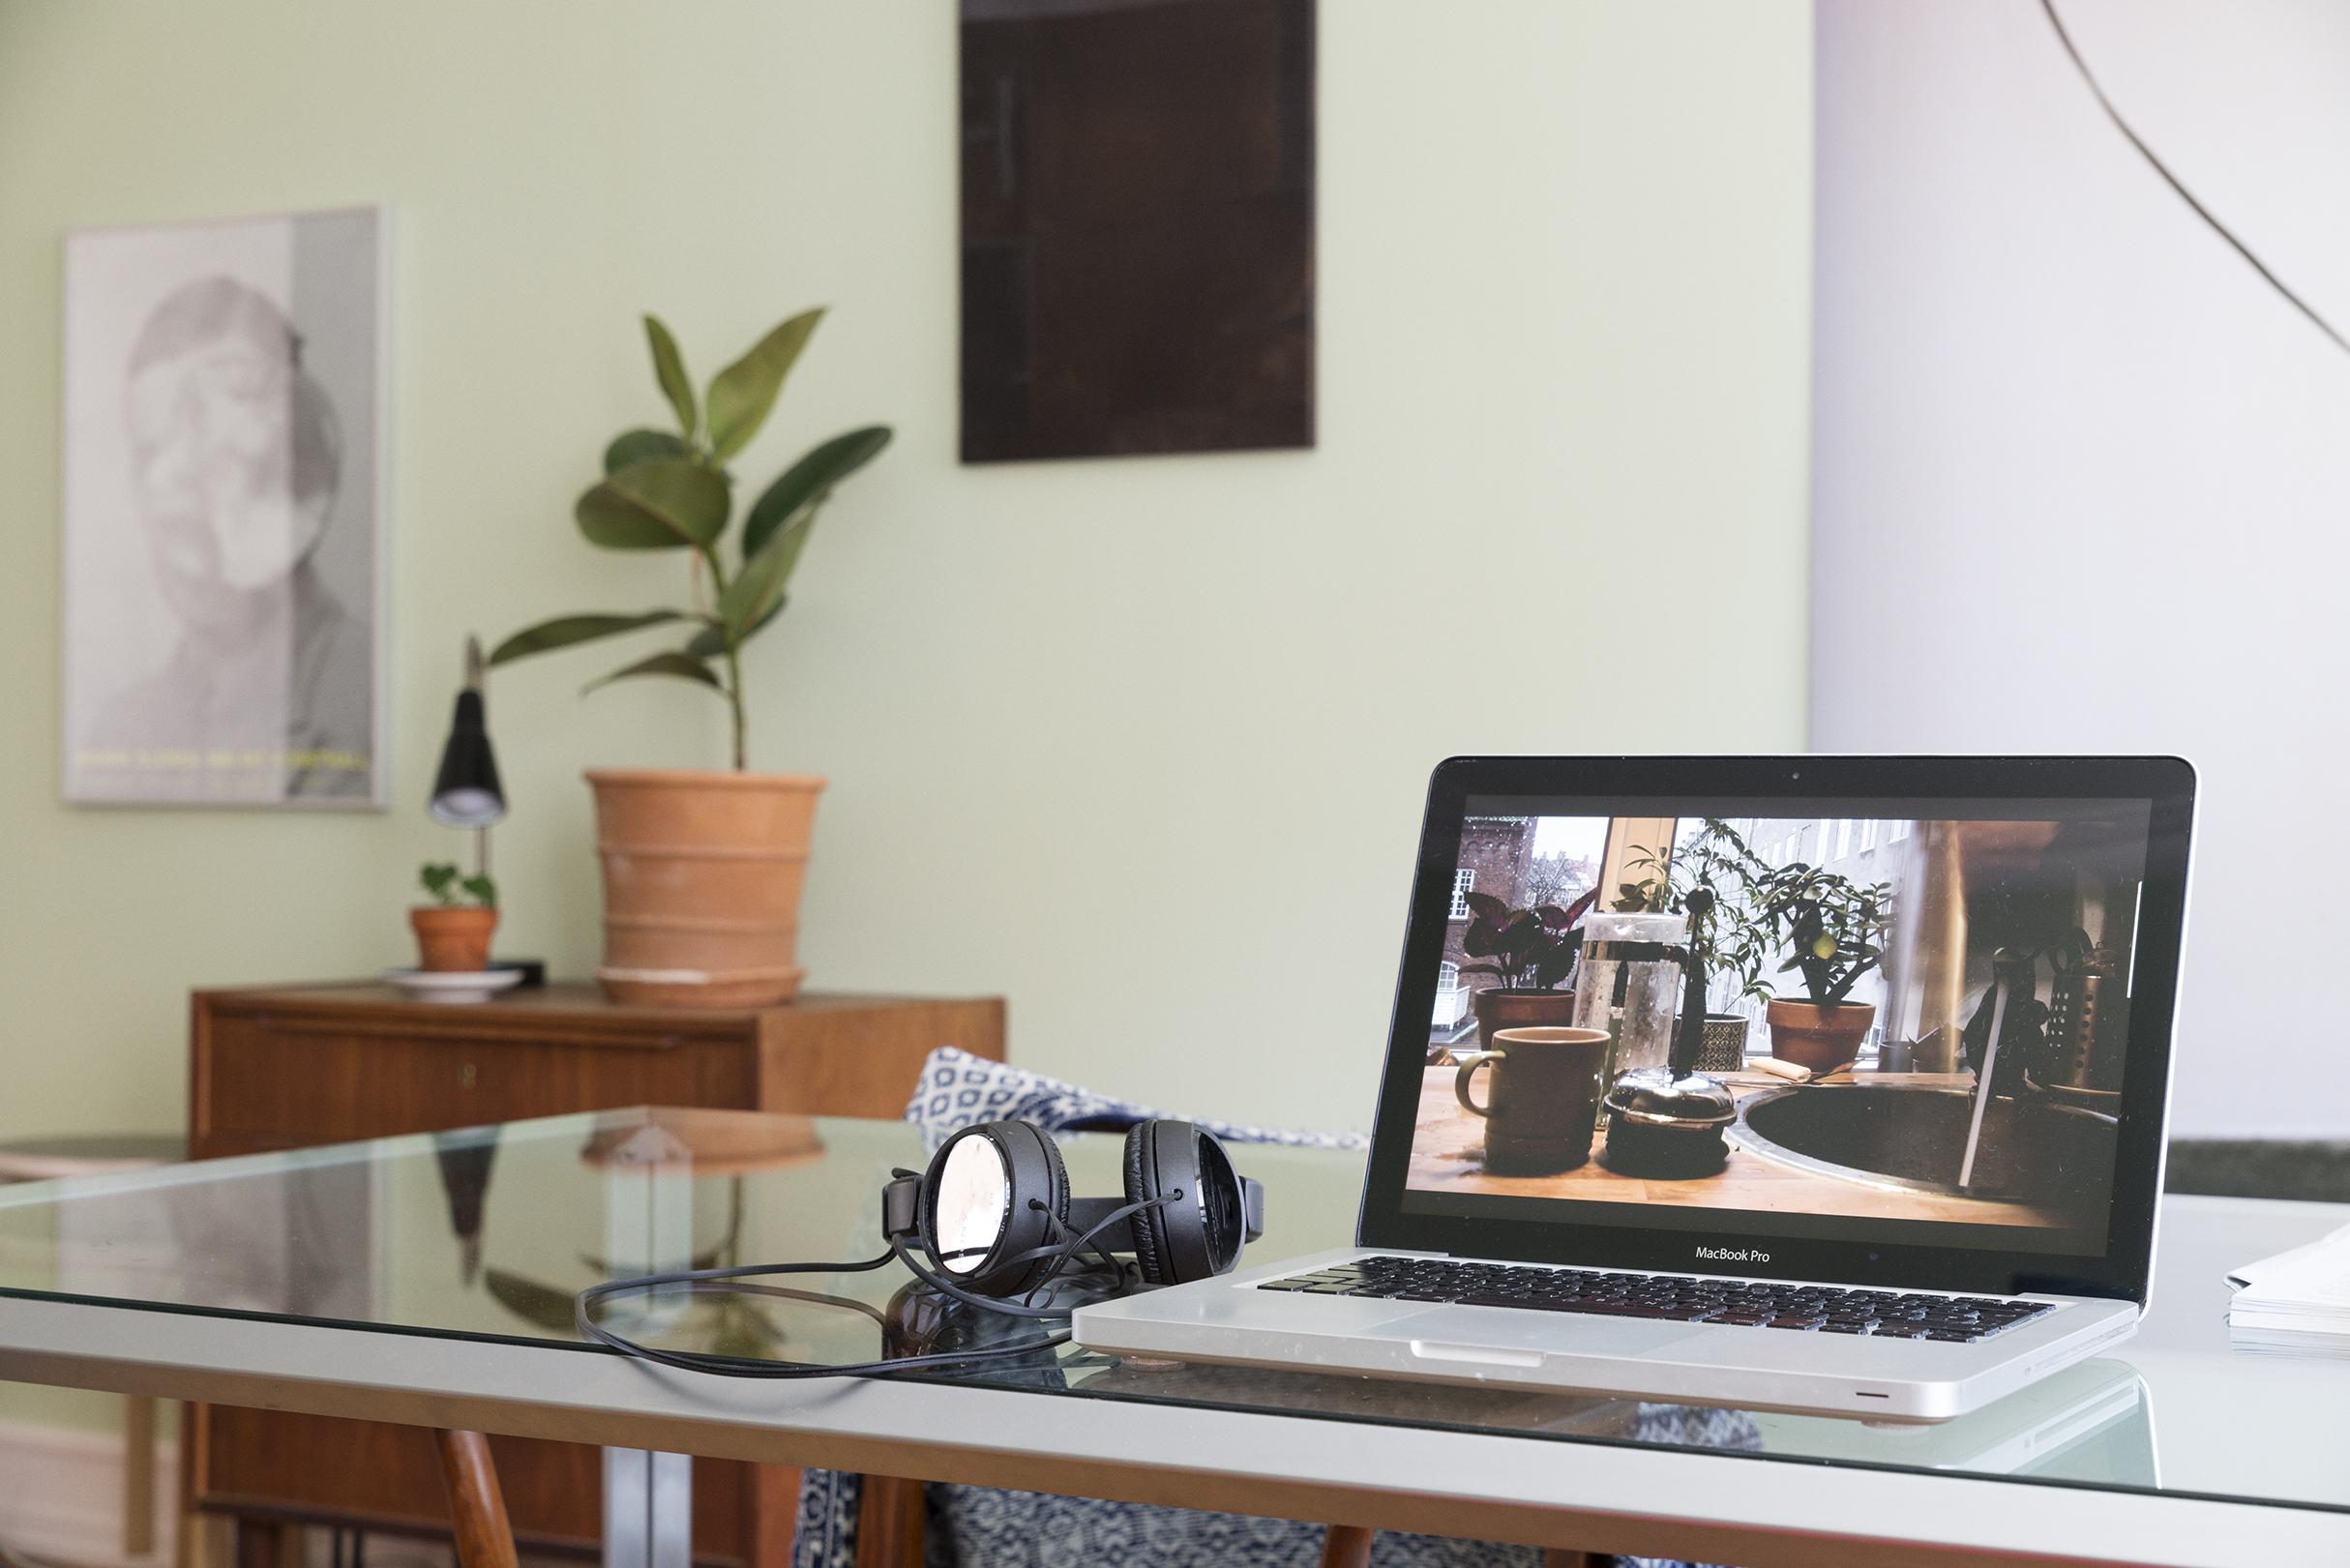 Kaffe Ritual (Coffee Ritual) (2012/2017),  video  7:47min, MacBook pro, table, Moa Alskog